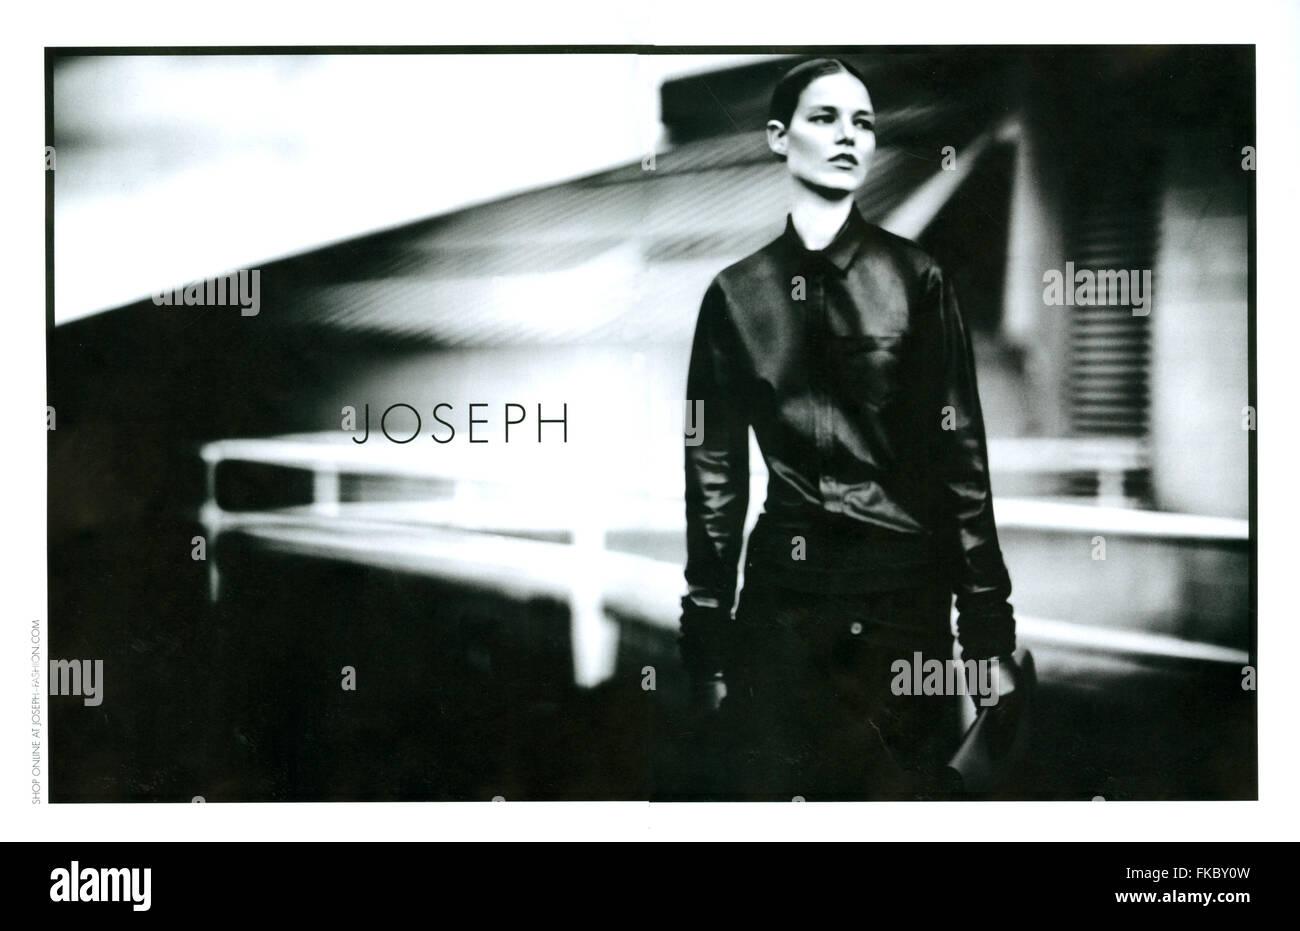 2010s UK Joseph Magazine Advert - Stock Image